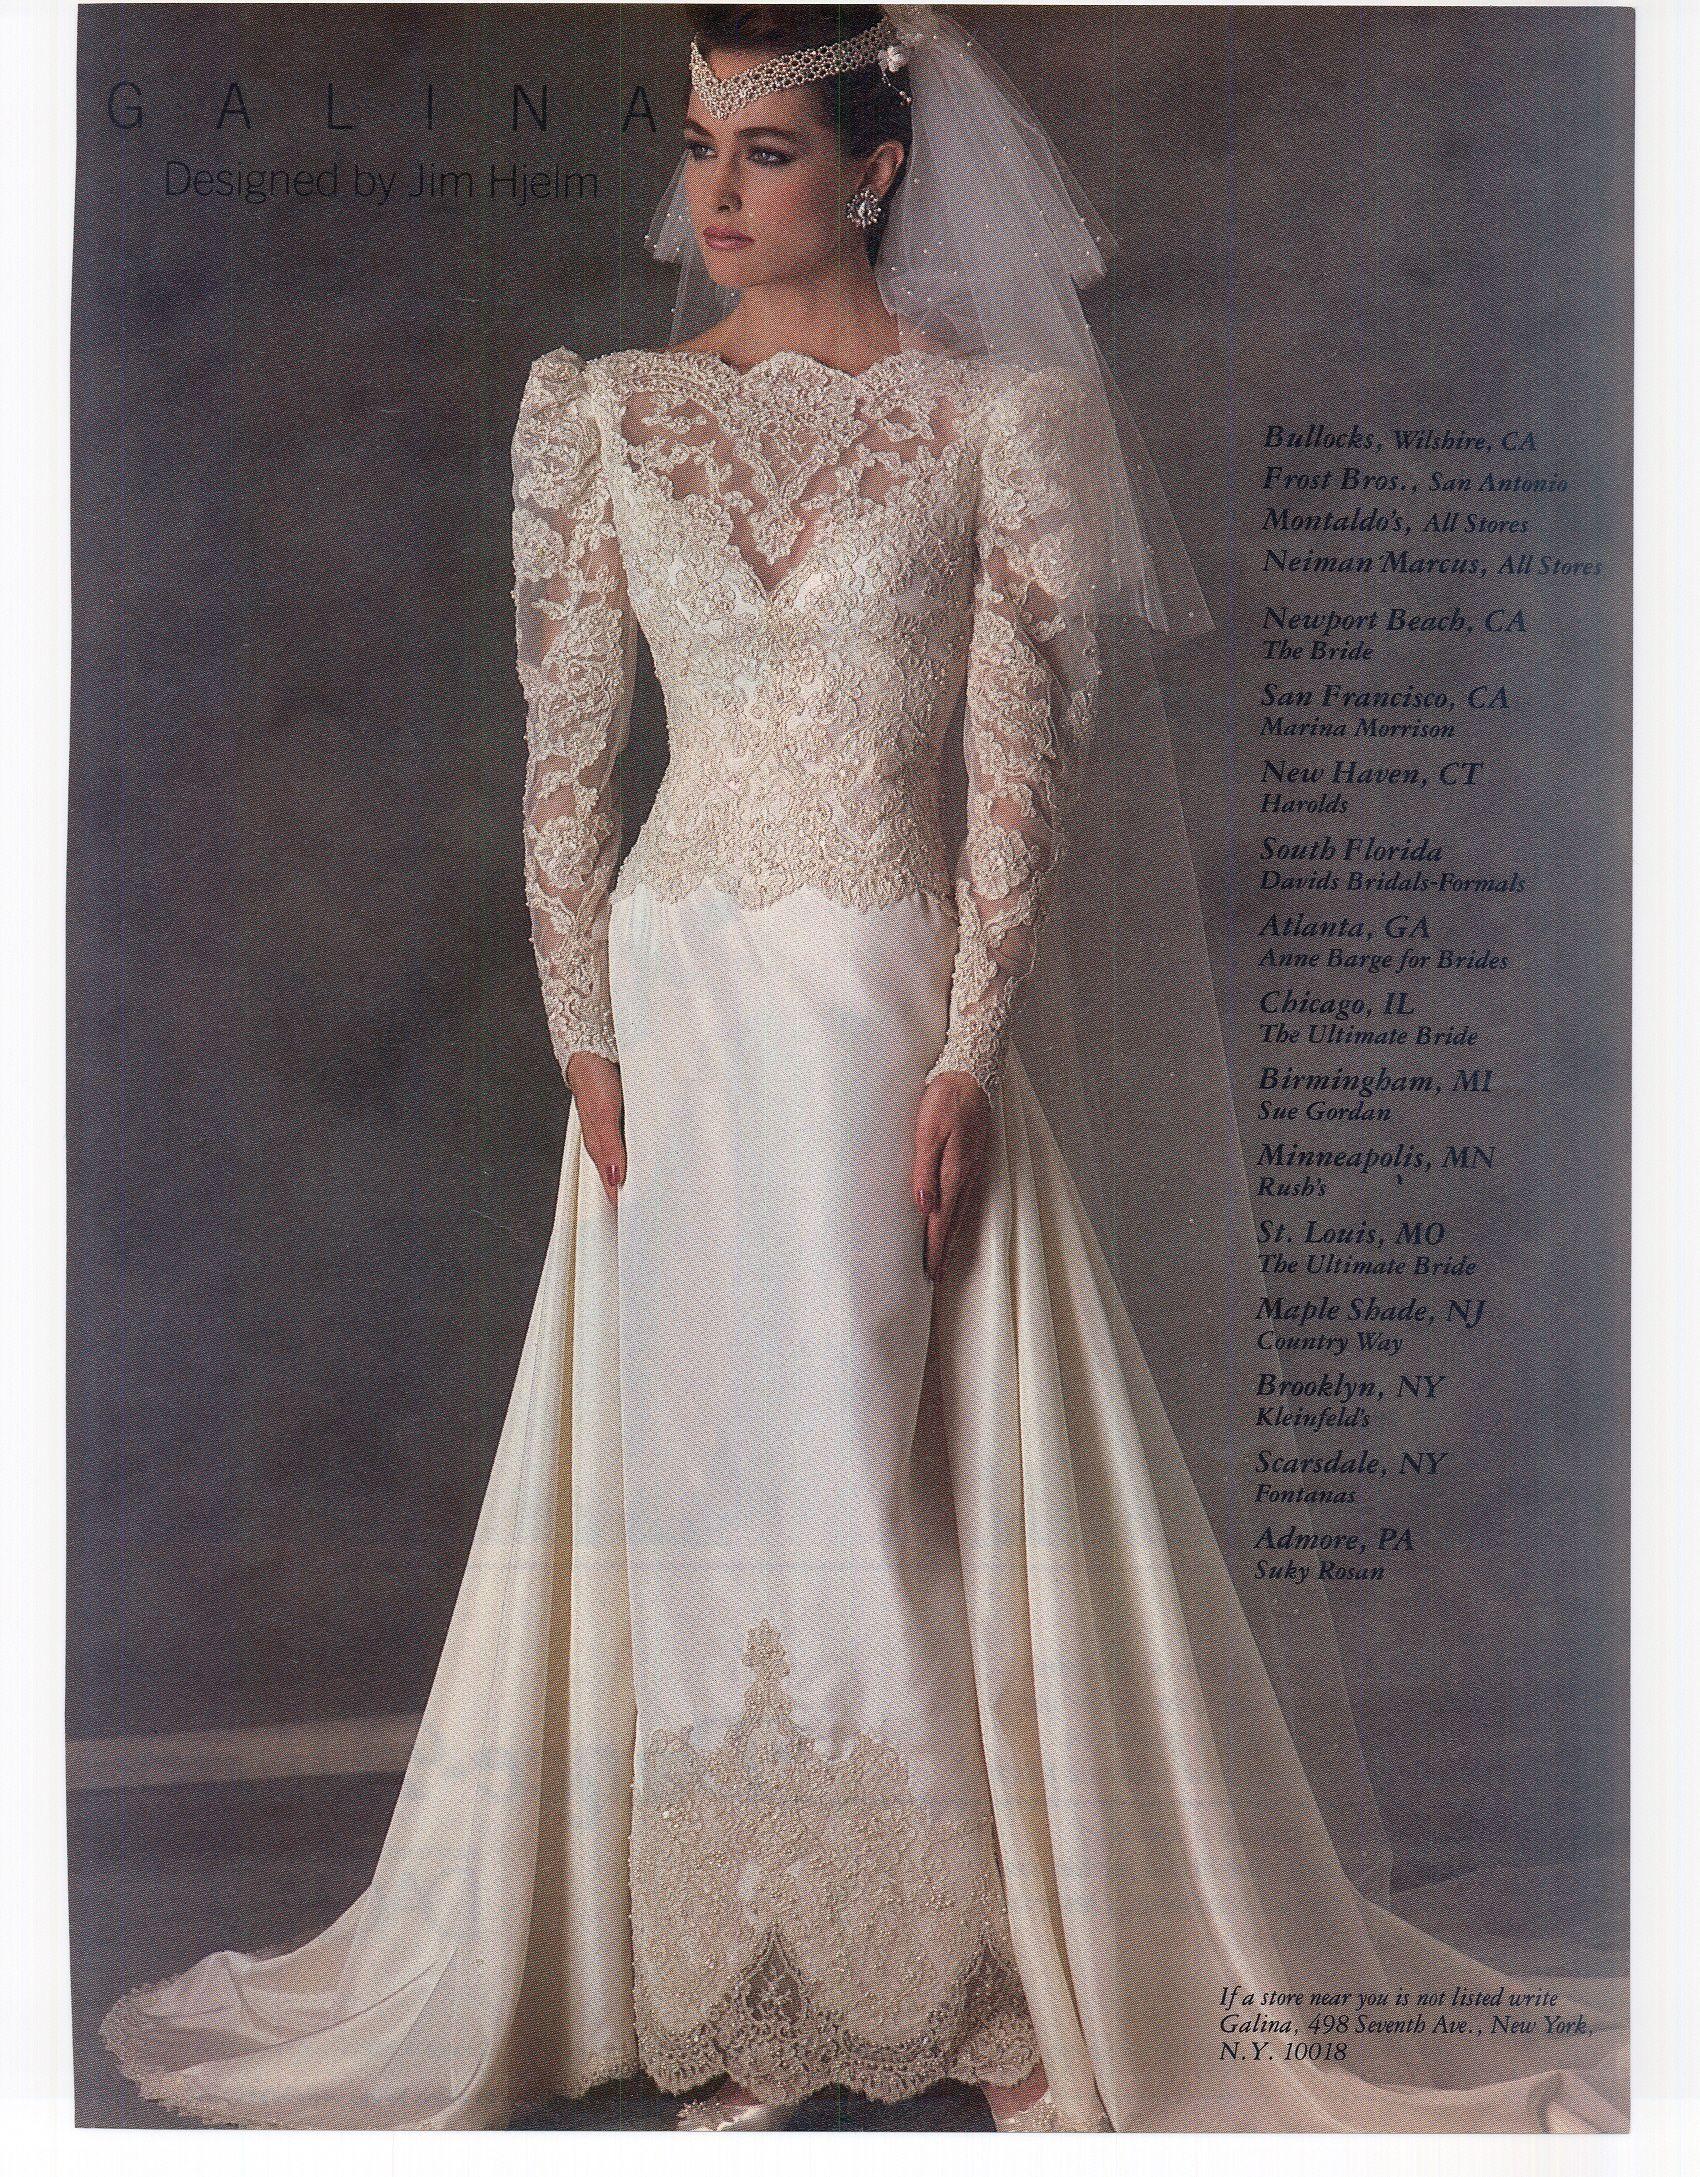 Modern Bride April May 1986 Wedding dresses,